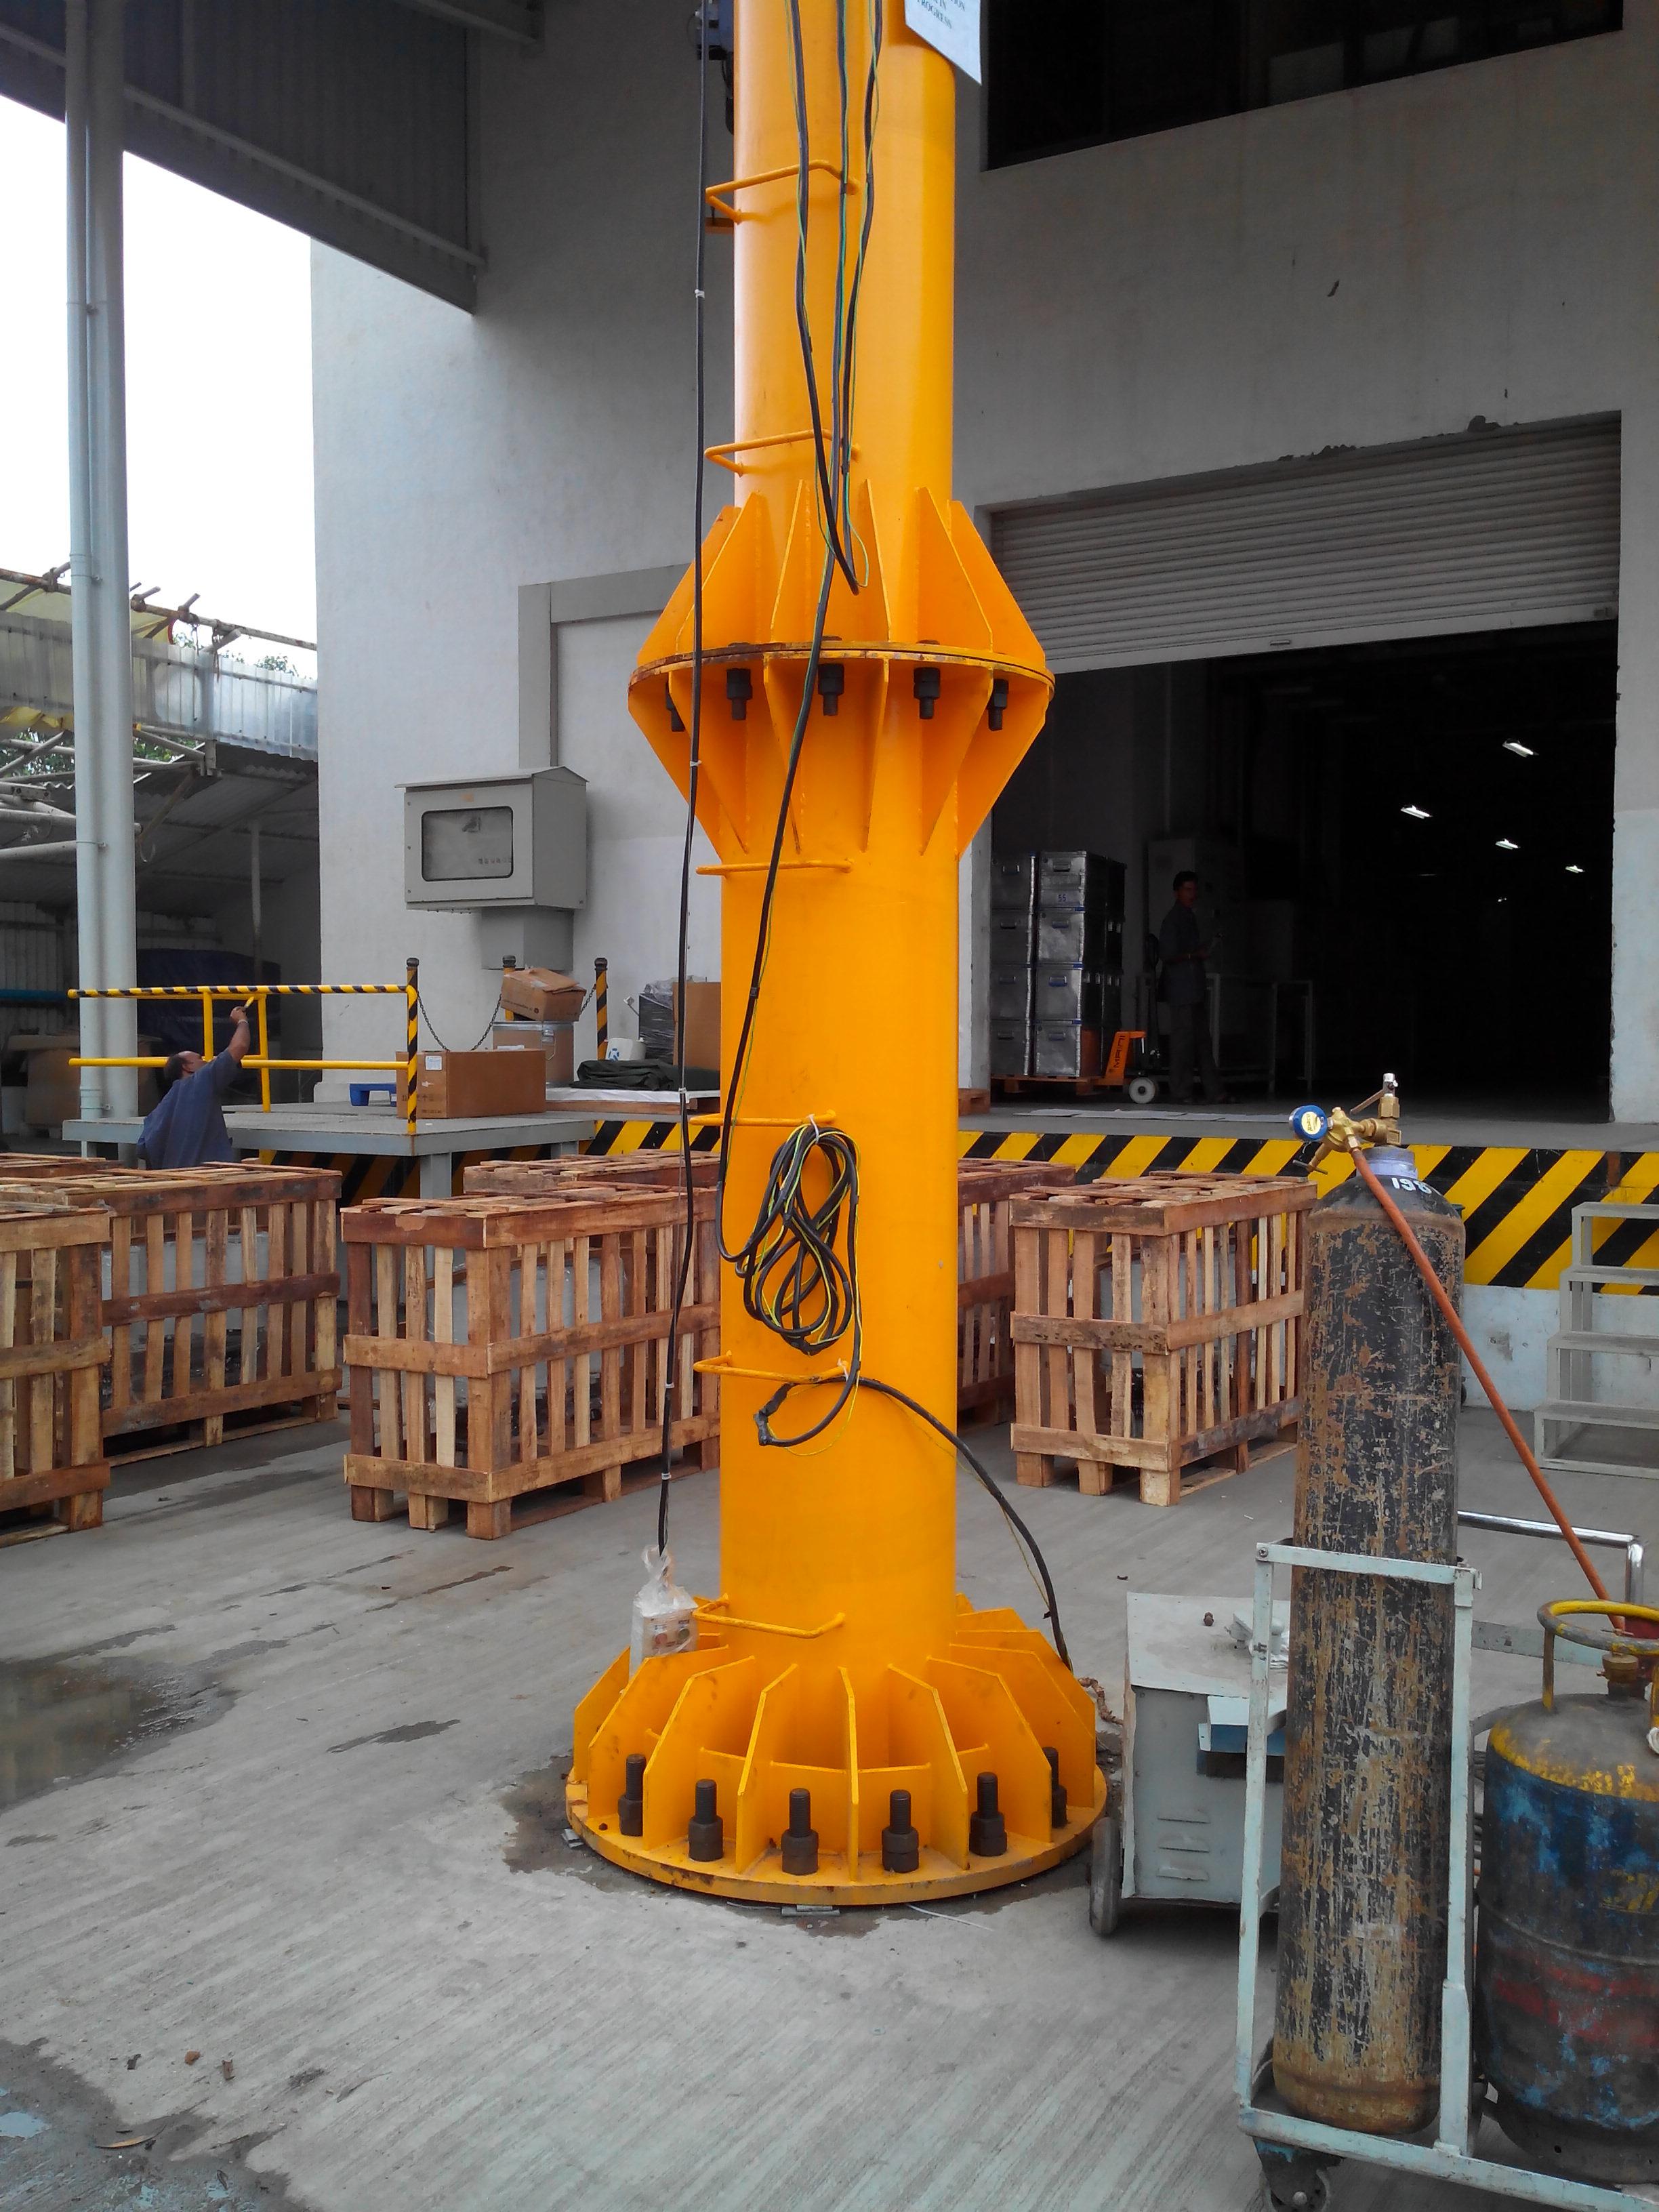 Motorized Wall Mounted Jib Crane : Jib crane manufacturer in ahmedabad gujarat india